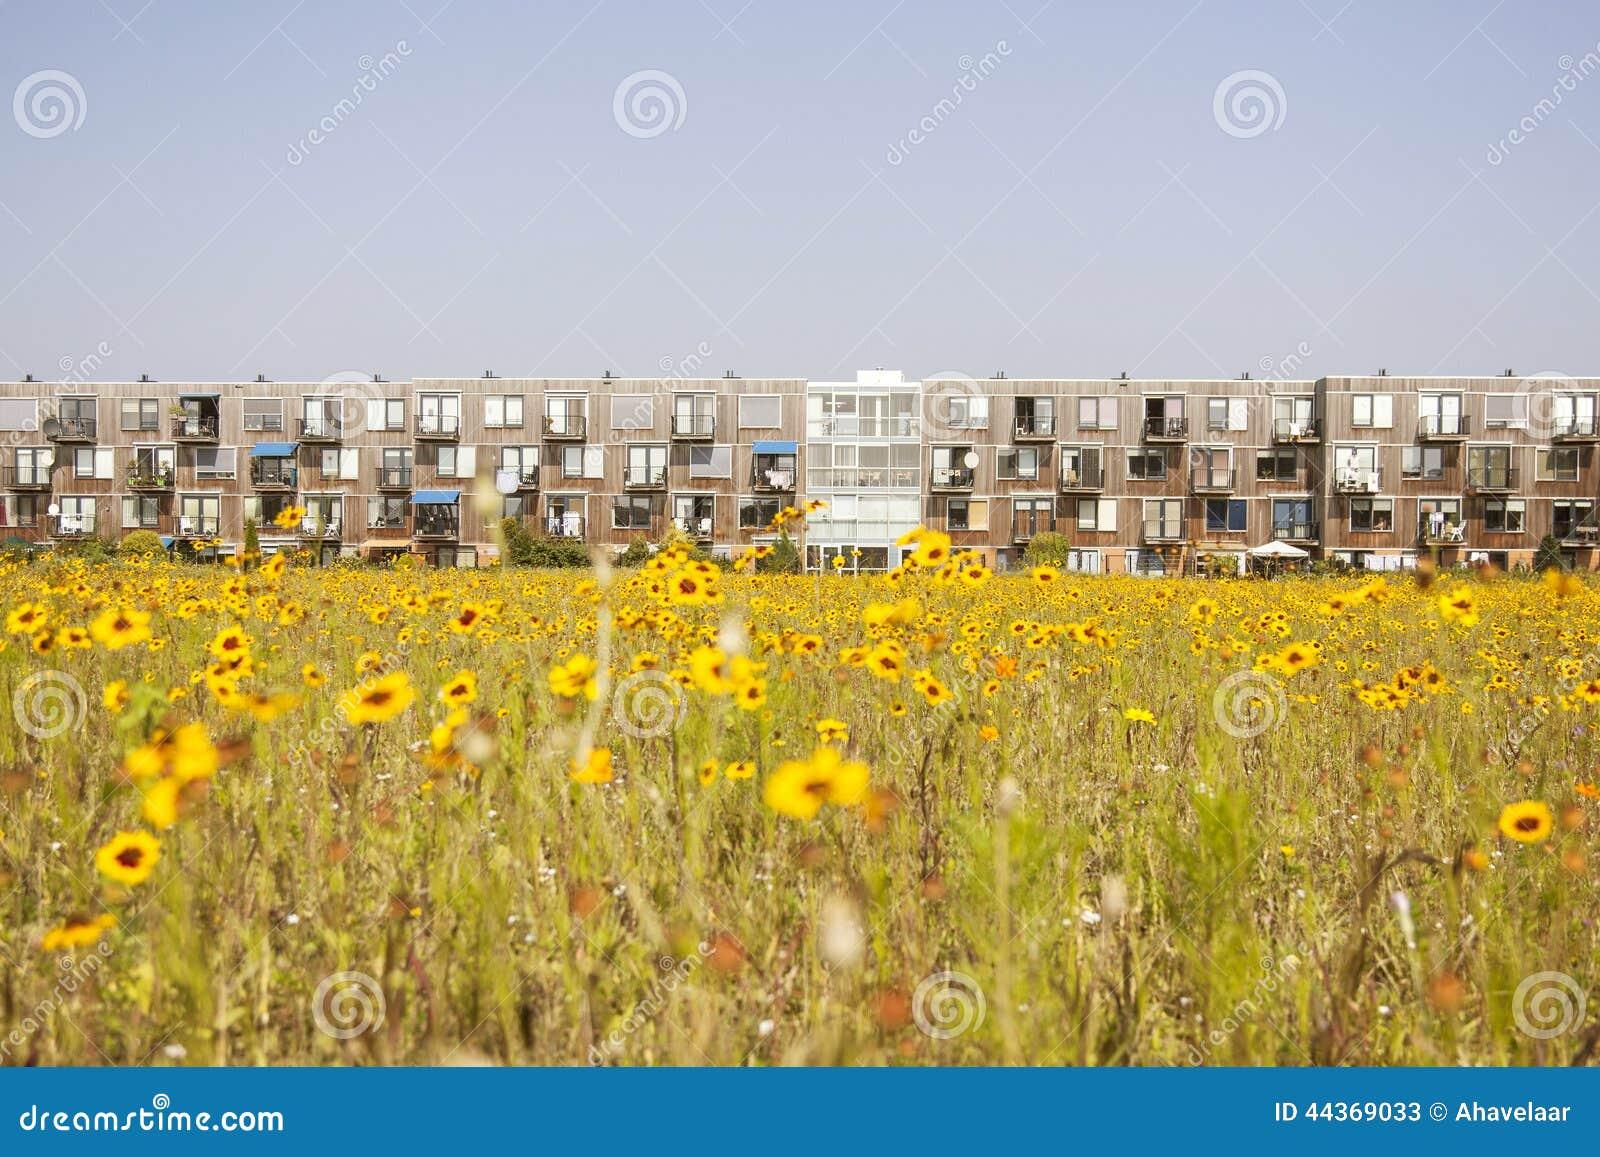 Fiore giallo ed alloggio olandese moderno